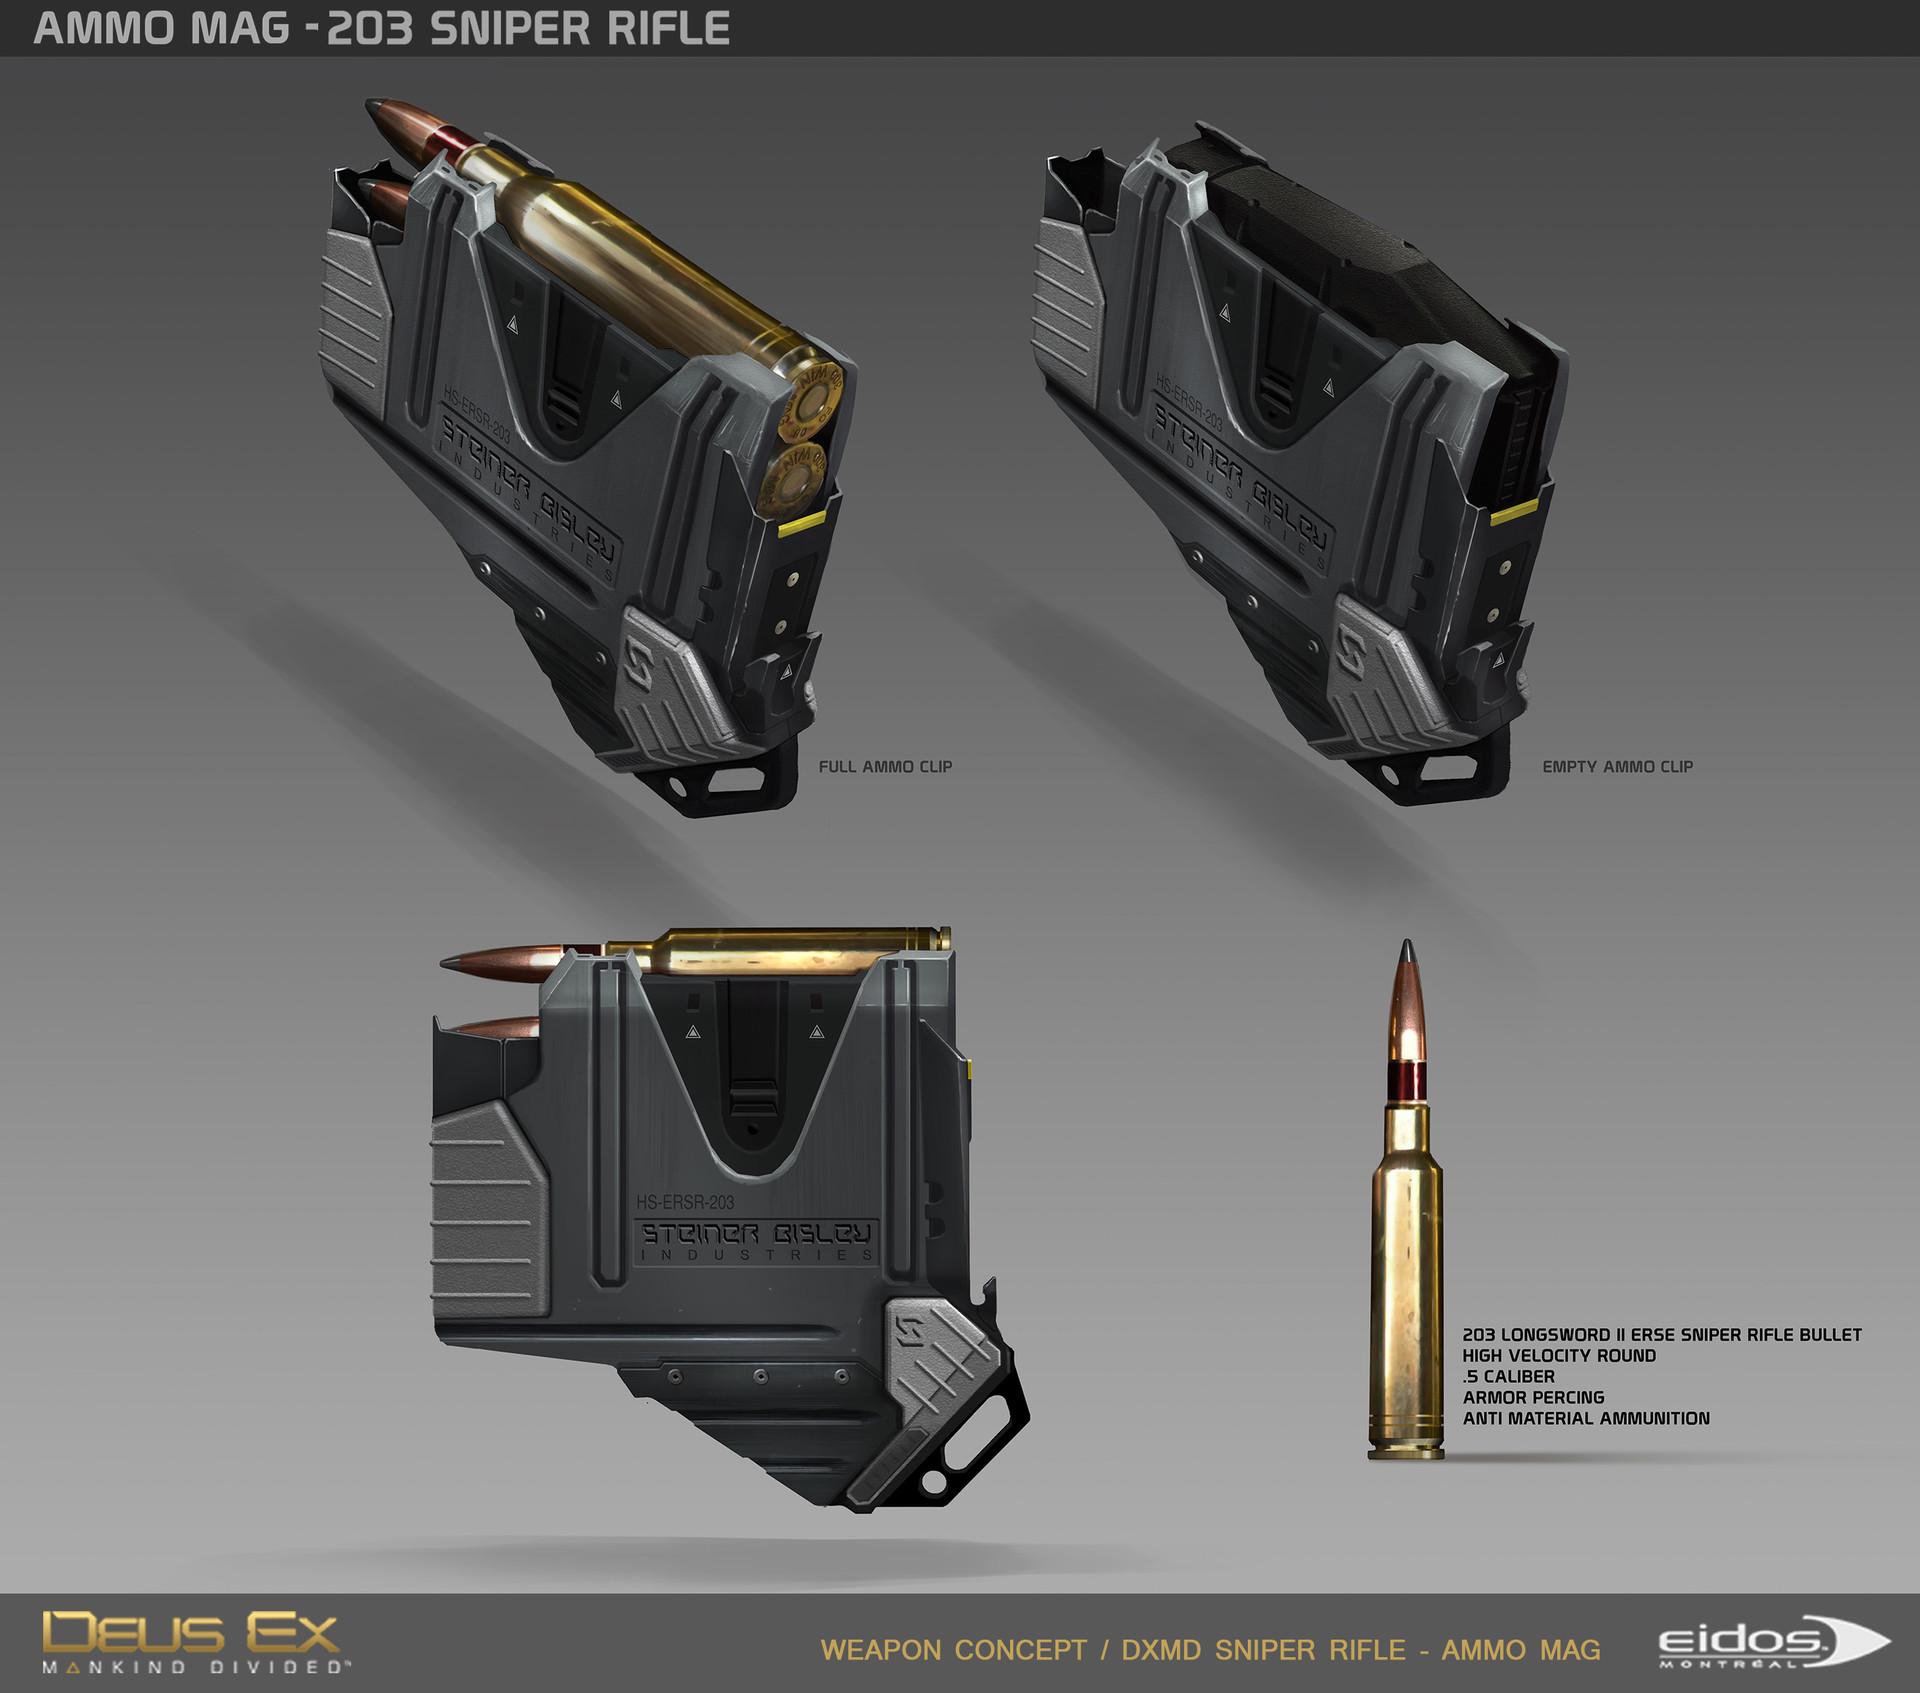 https://cdnb.artstation.com/p/assets/images/images/003/725/421/large/martin-sabran-msab-msabran-sniperrifle-magammo-concept.jpg?1476839002